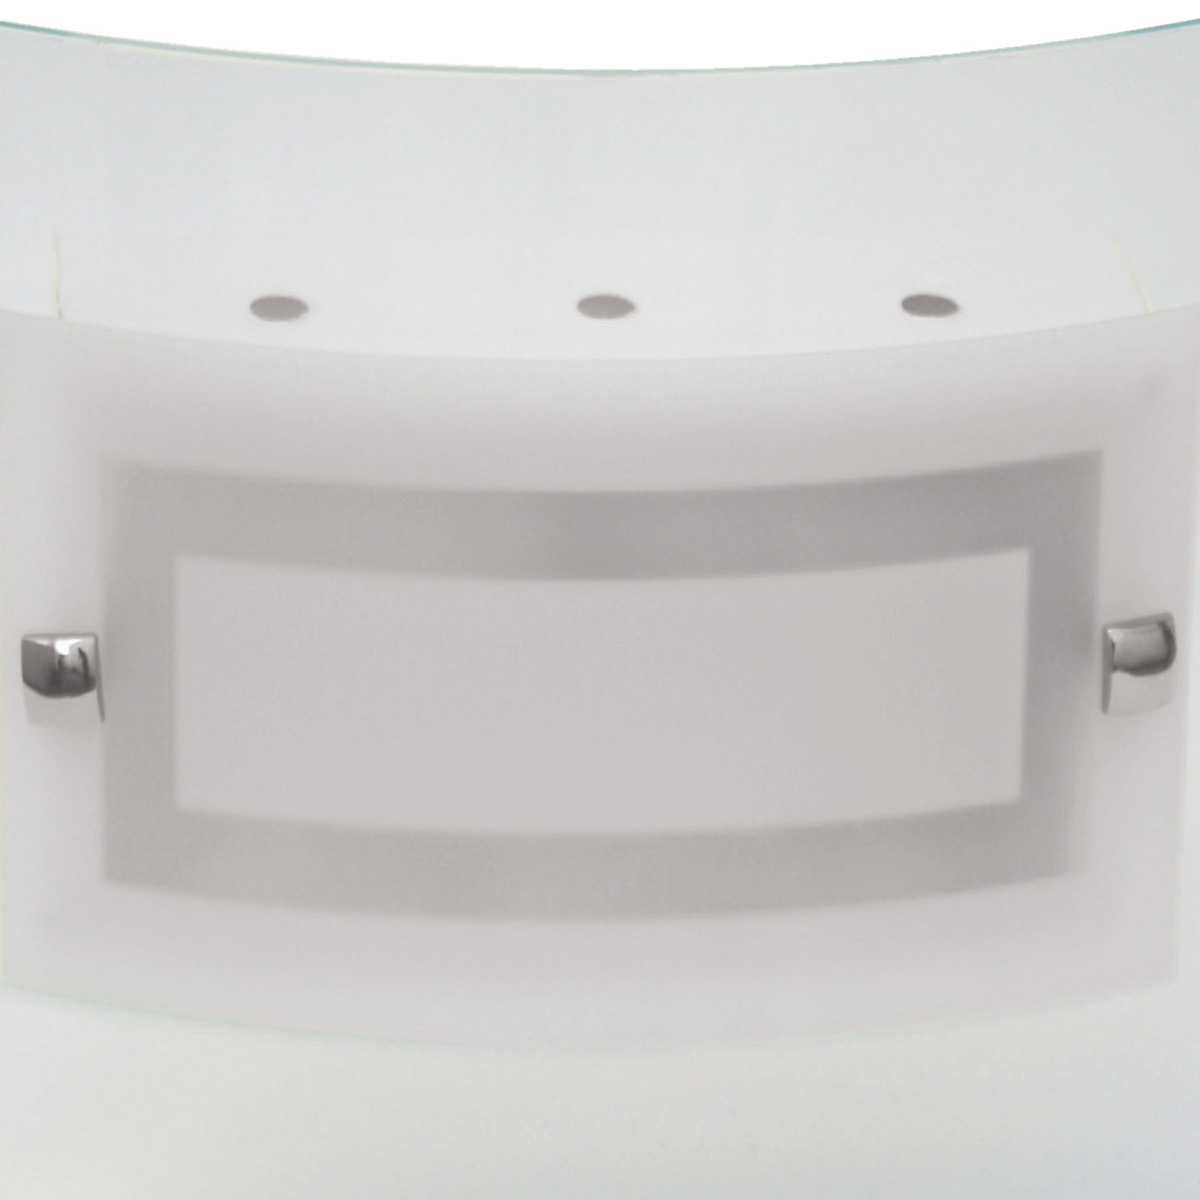 Plafon Artico 40x40cm Com Vidro Curvo Fosco E-27 3 Lamp. Max 60w